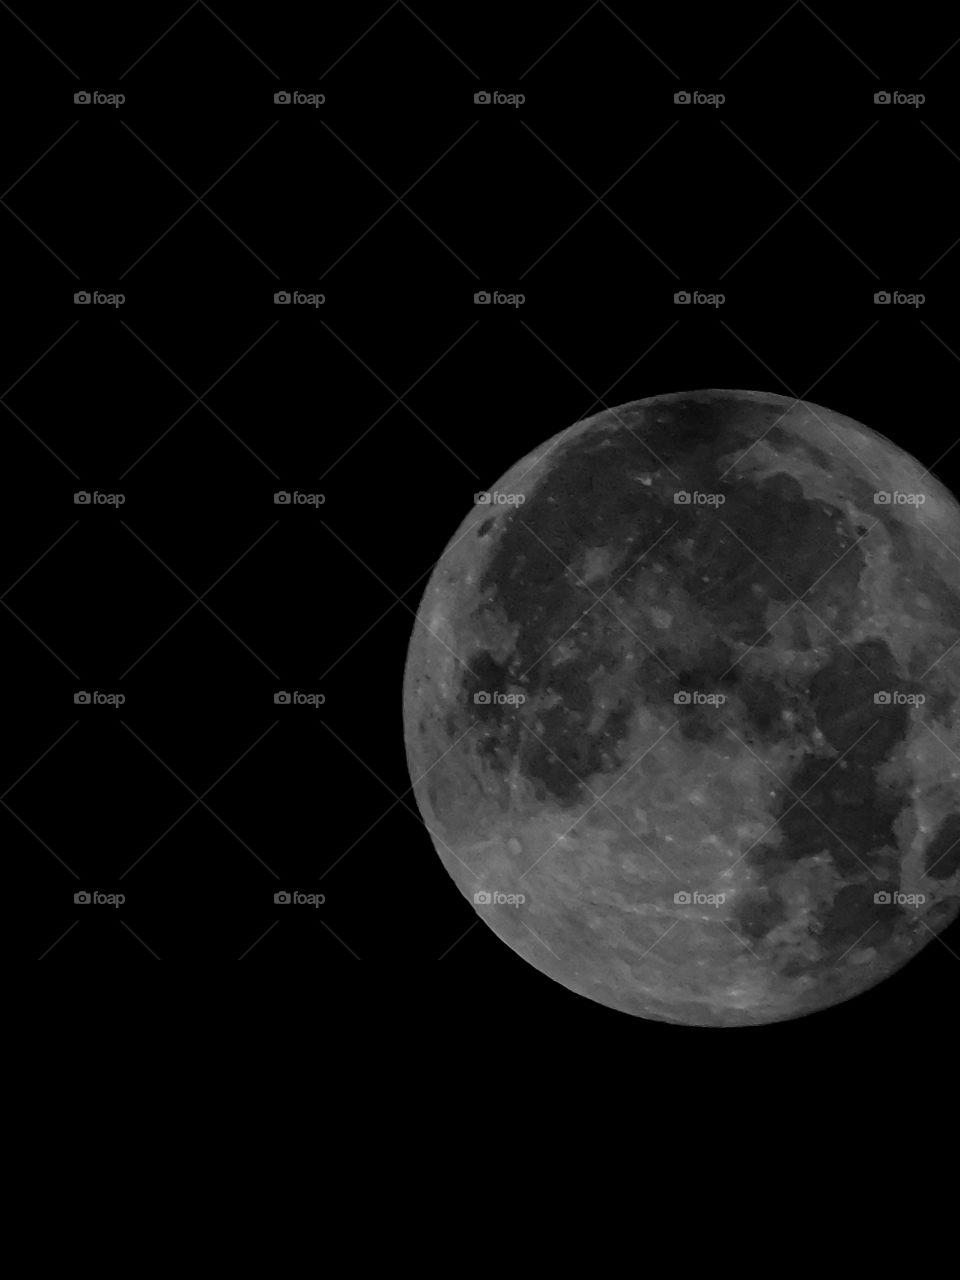 Full Moon with Dark Black background